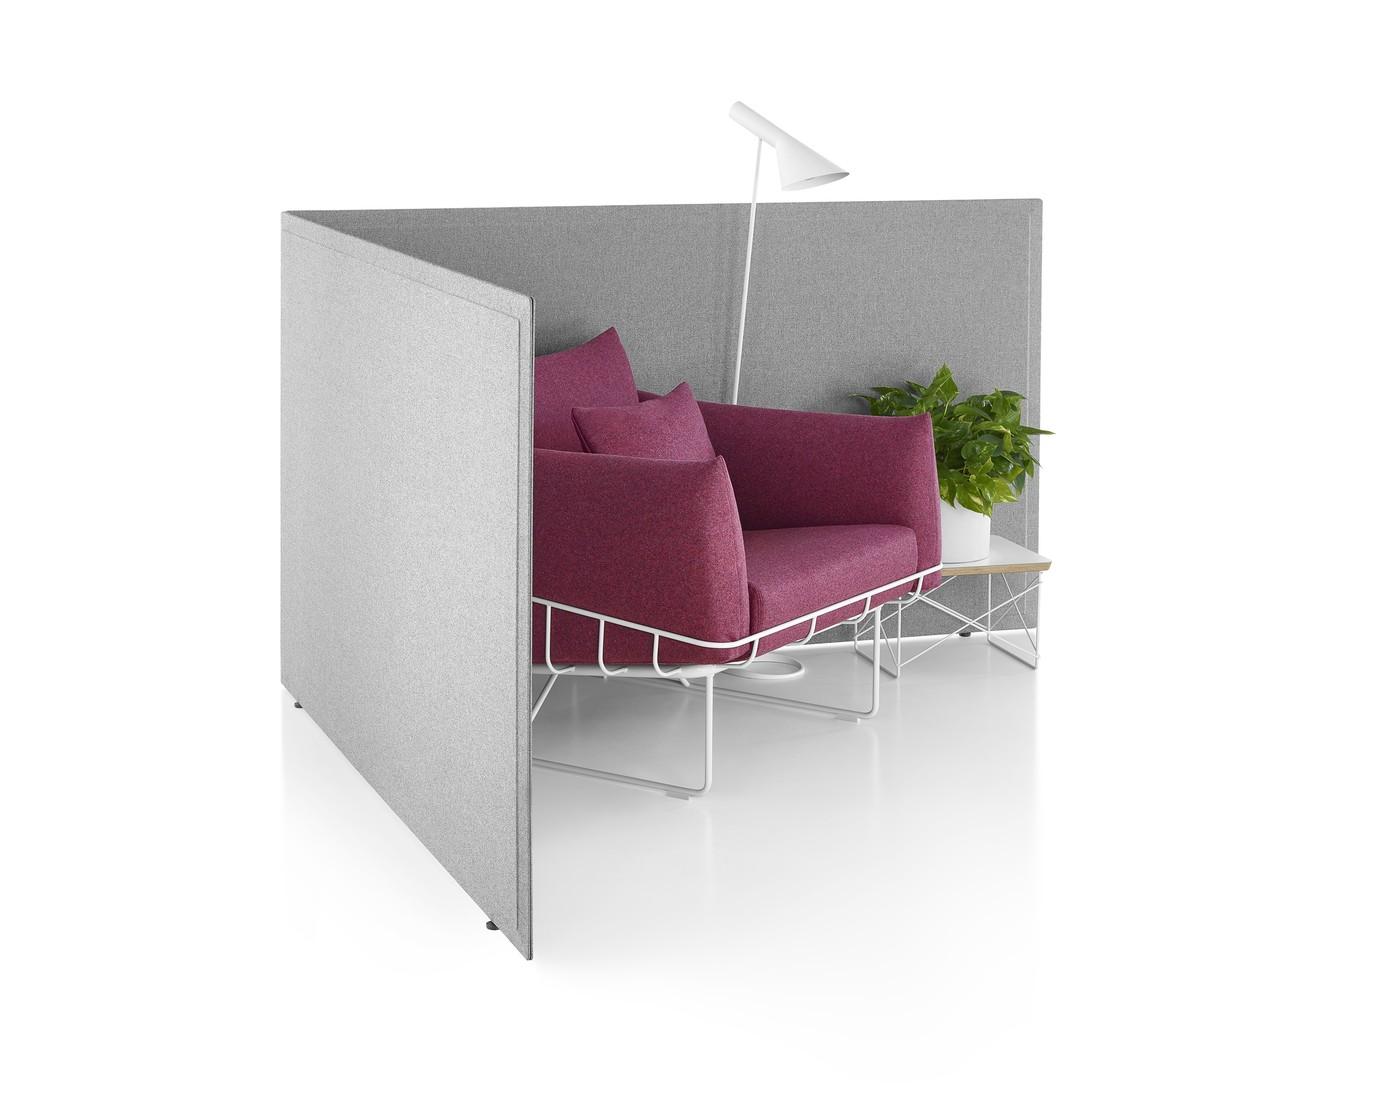 2-Silla-Lounge-Wireframe-1-1380